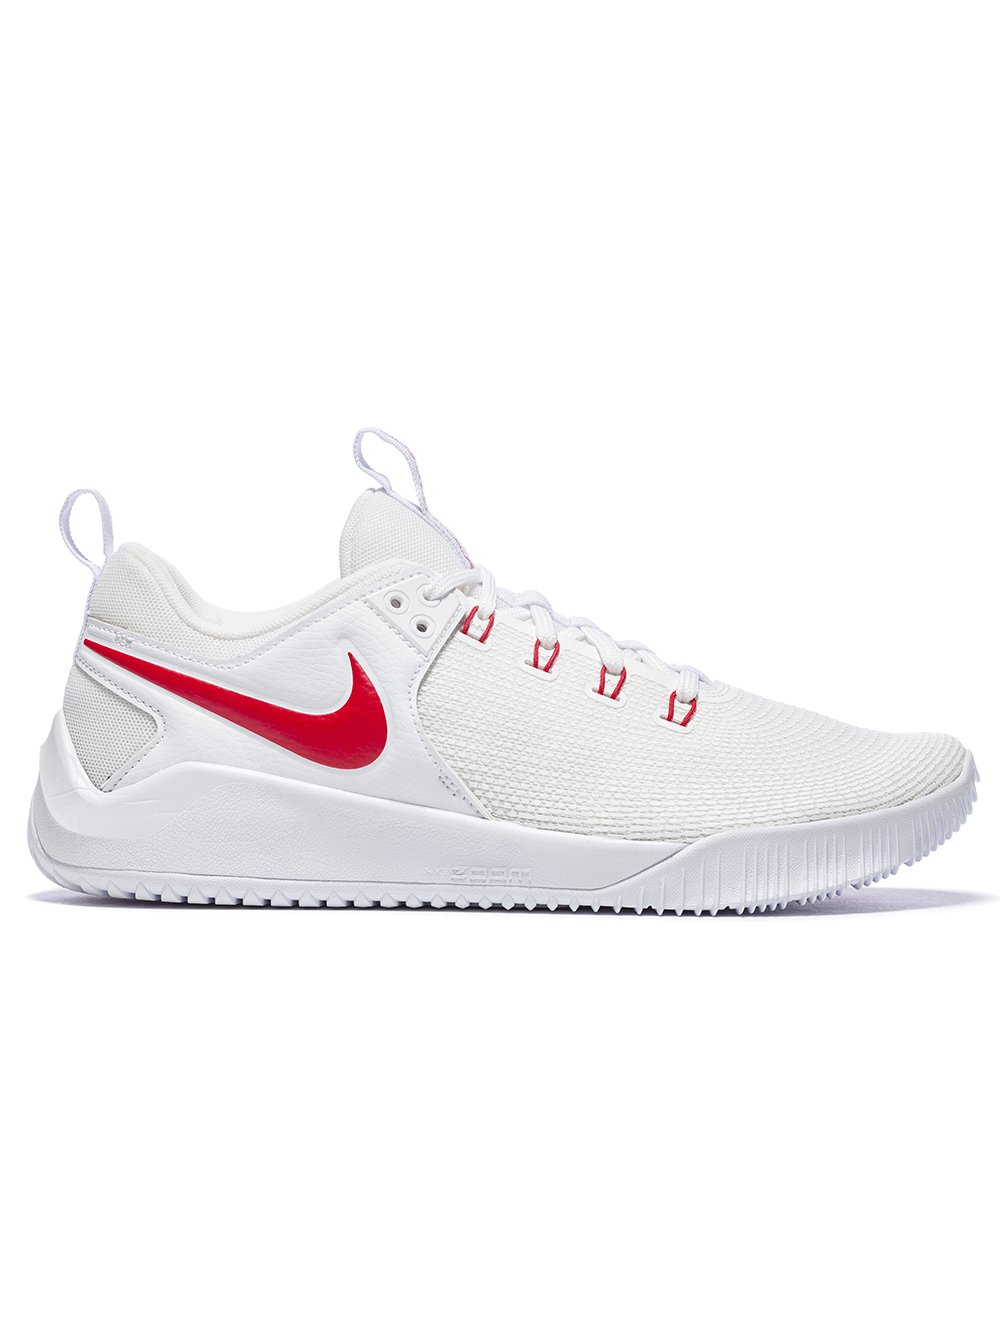 bac877ca689670 Galleon - Nike Women s Zoom HyperAce 2 Training Shoe White University Red  Size 7 M US